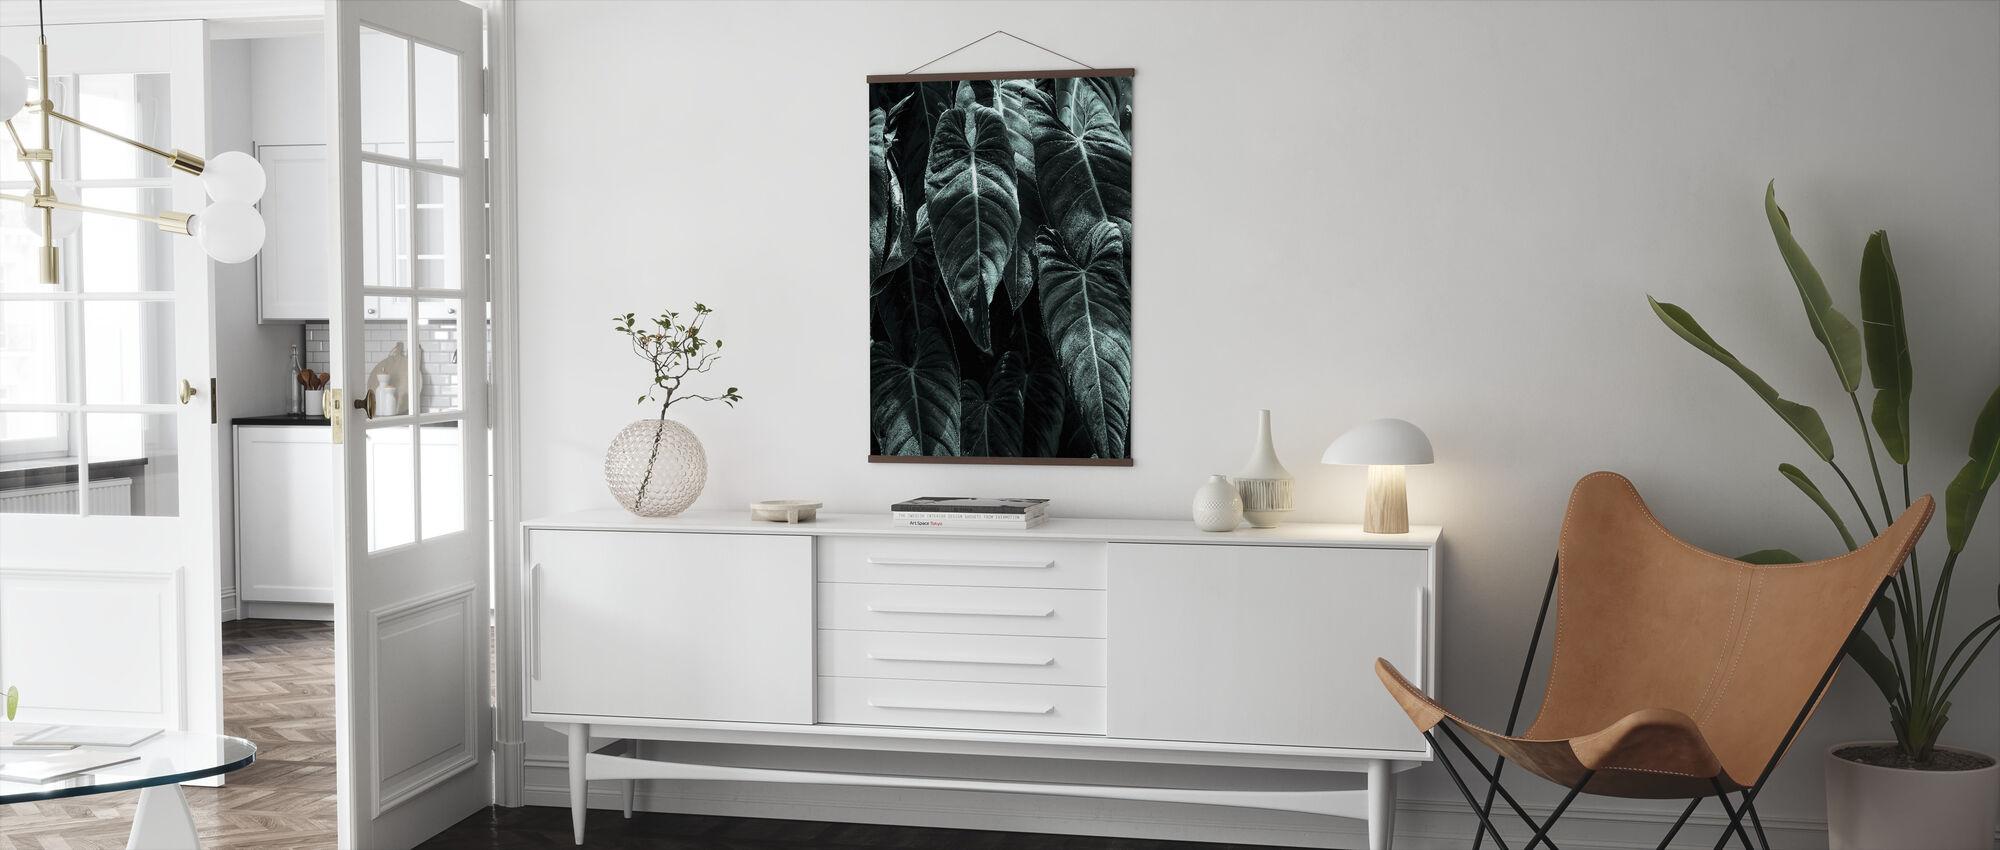 Djungel - Poster - Vardagsrum